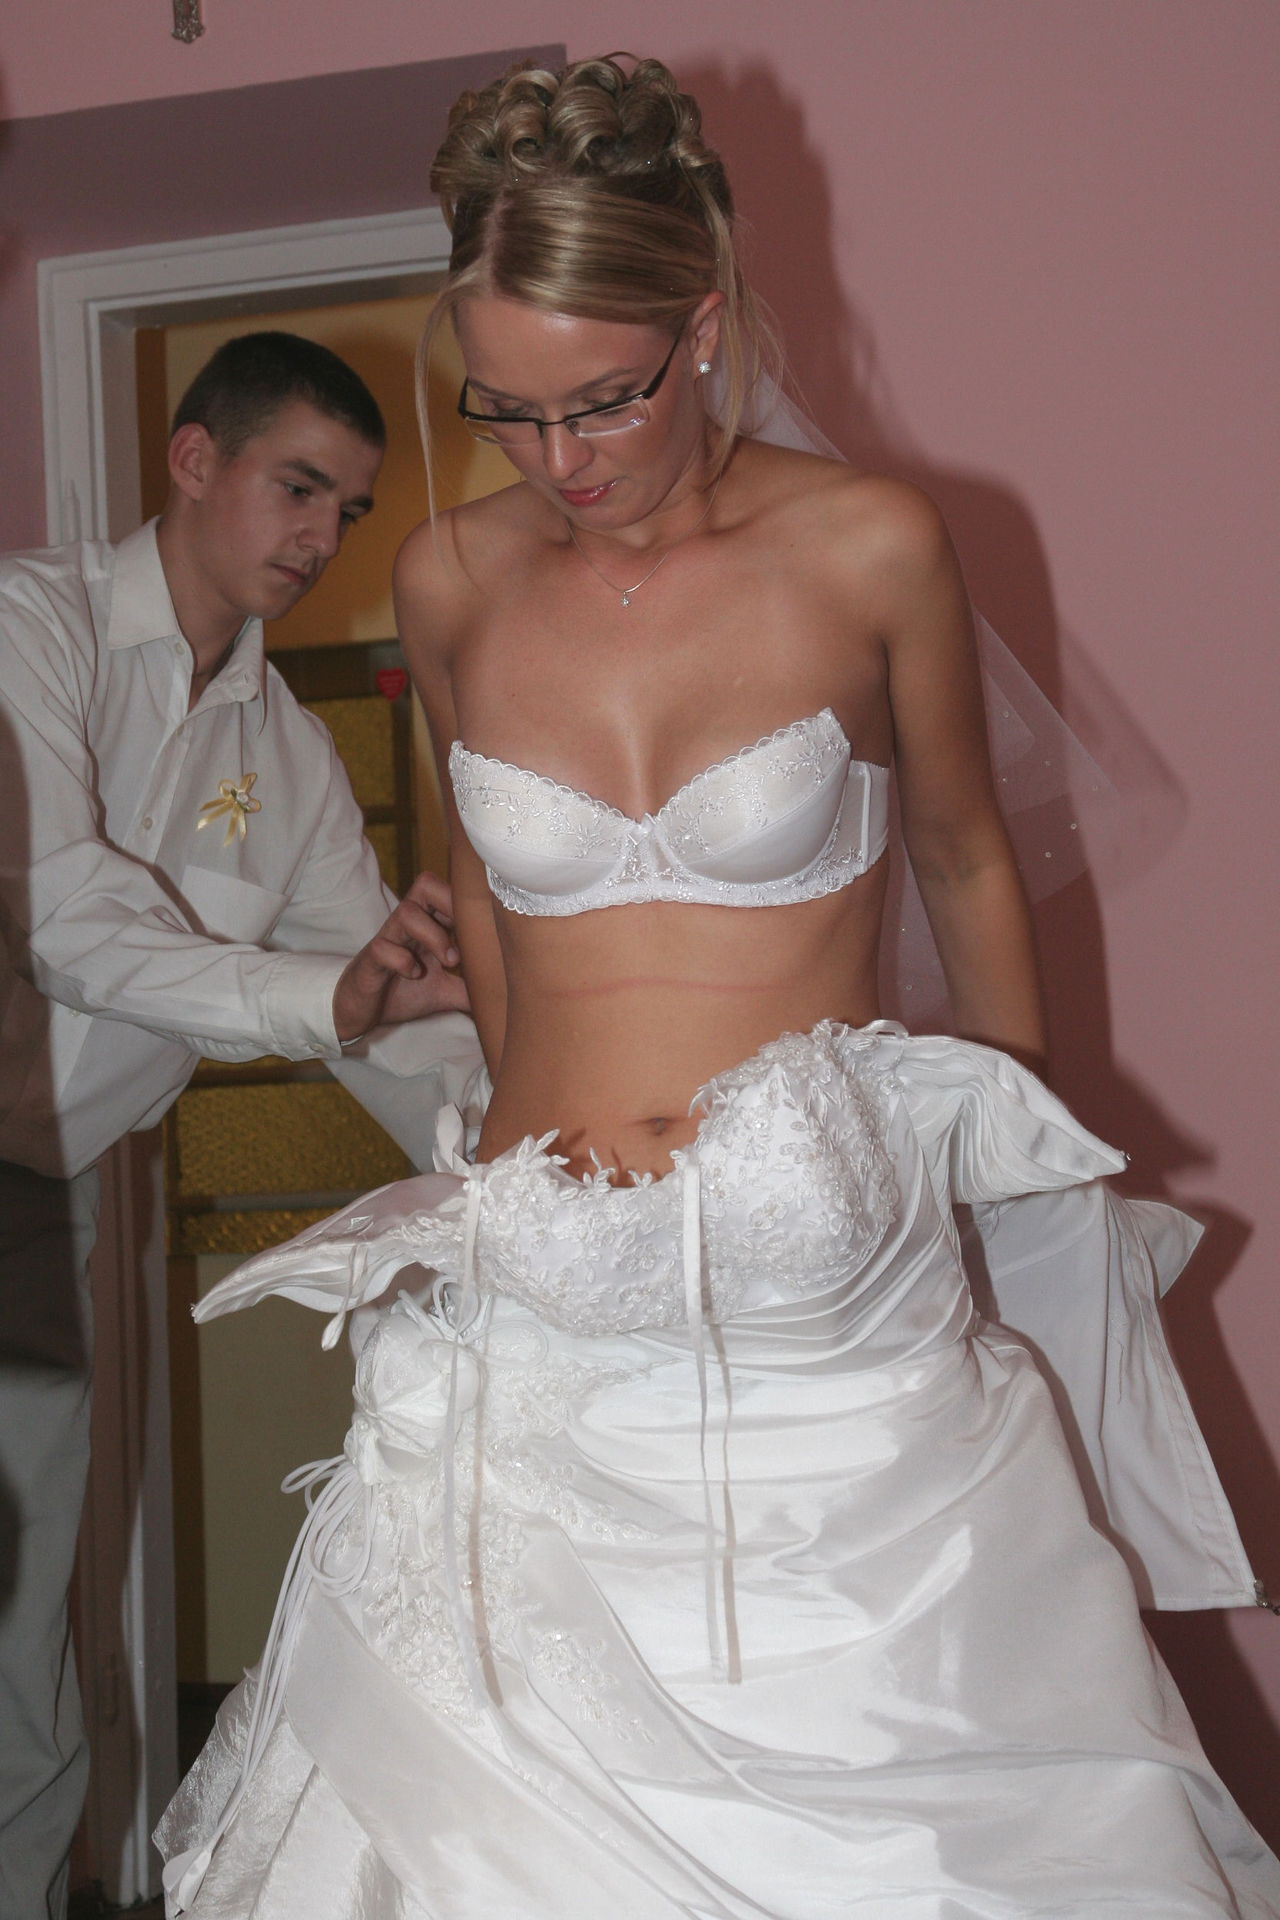 https://voyeurpapa.com/wp-content/uploads/2016/12/Wedding-skandall-SEXY-and-NUDE-595.jpg